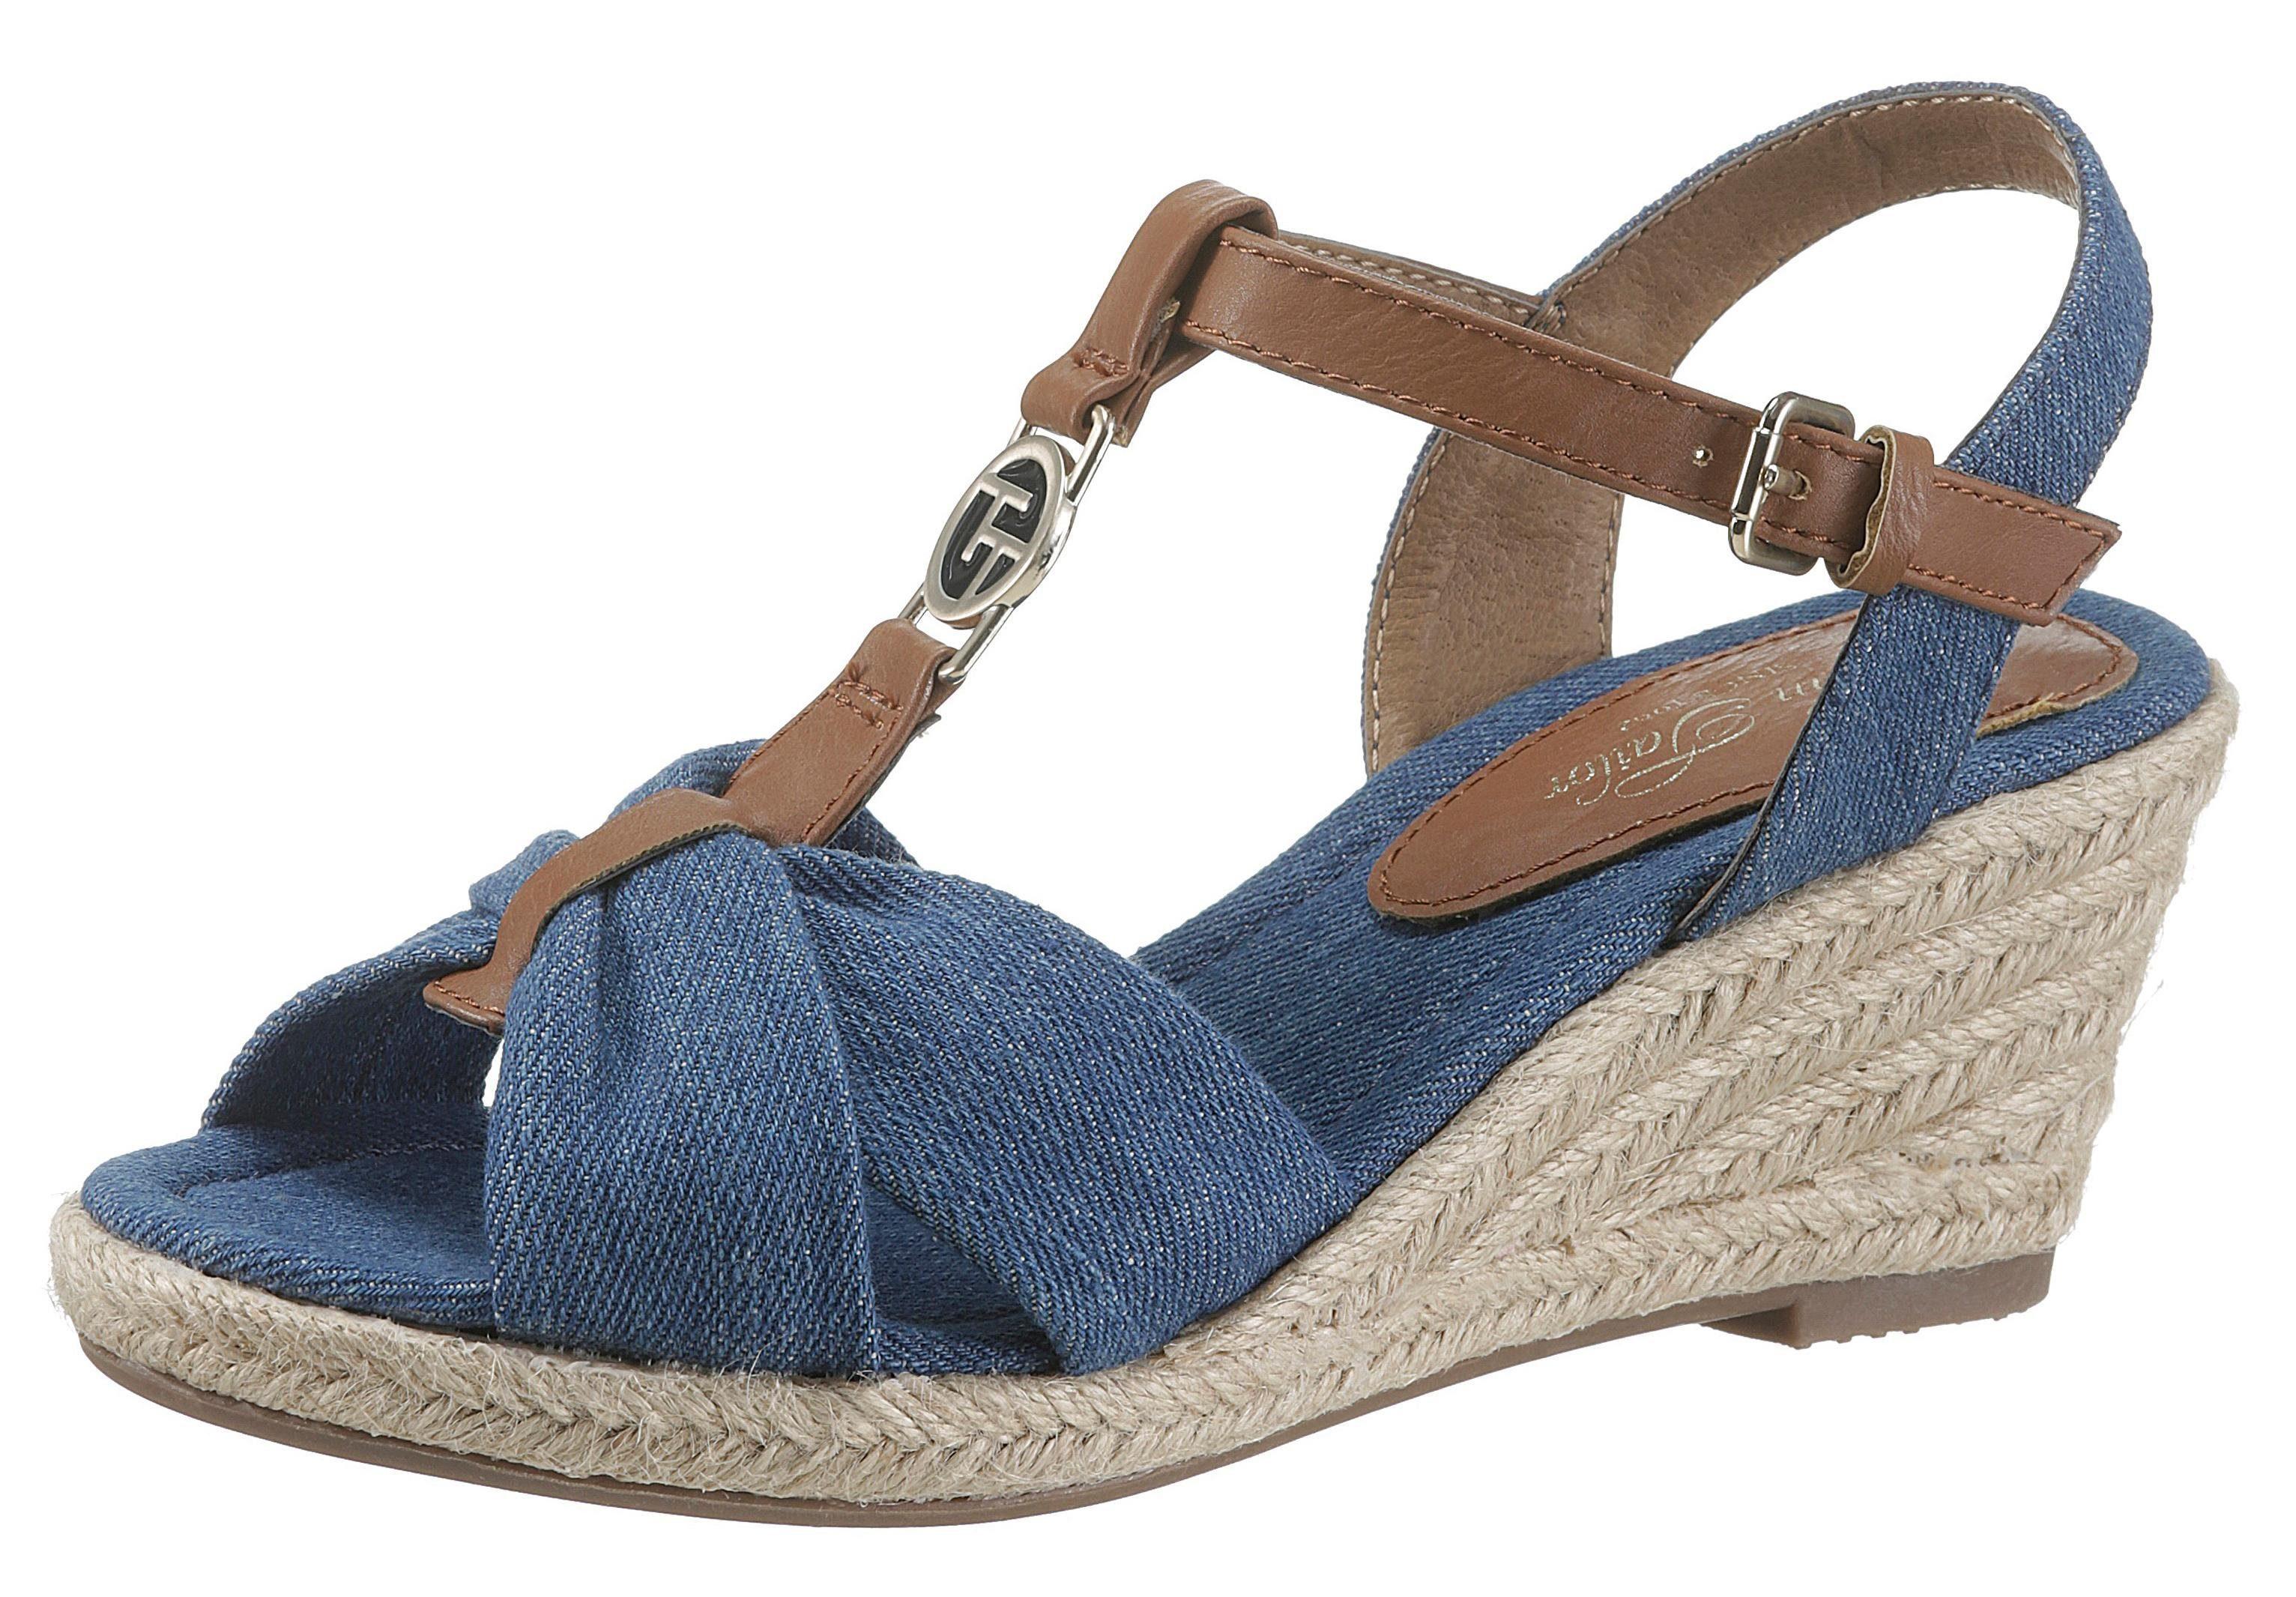 TOM TAILOR Sandalette in Jeans-Optik